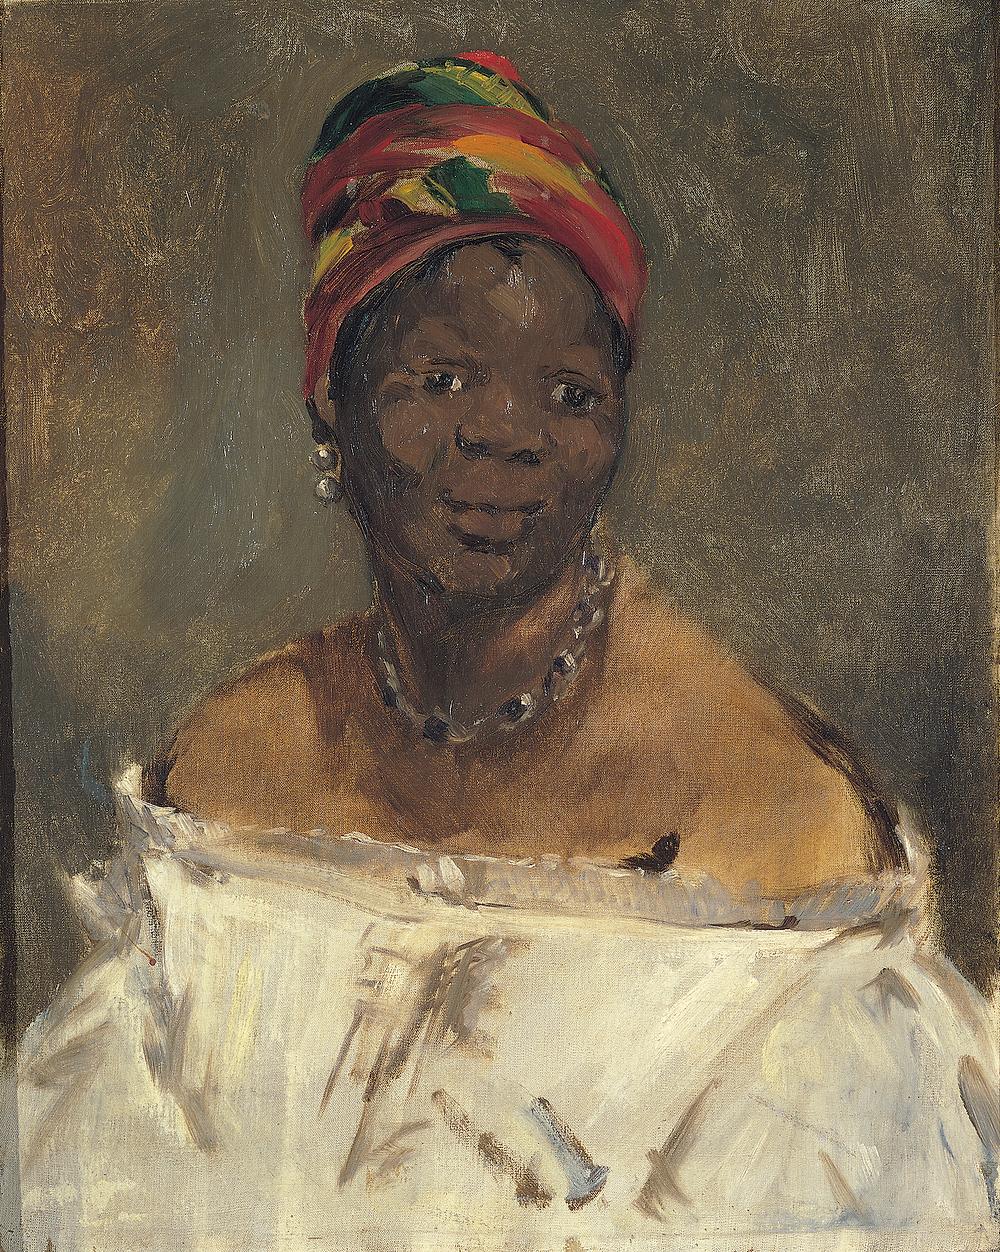 Édouard Manet, La négresse (Portrait of Laure), on view at the Wallach Art Gallery